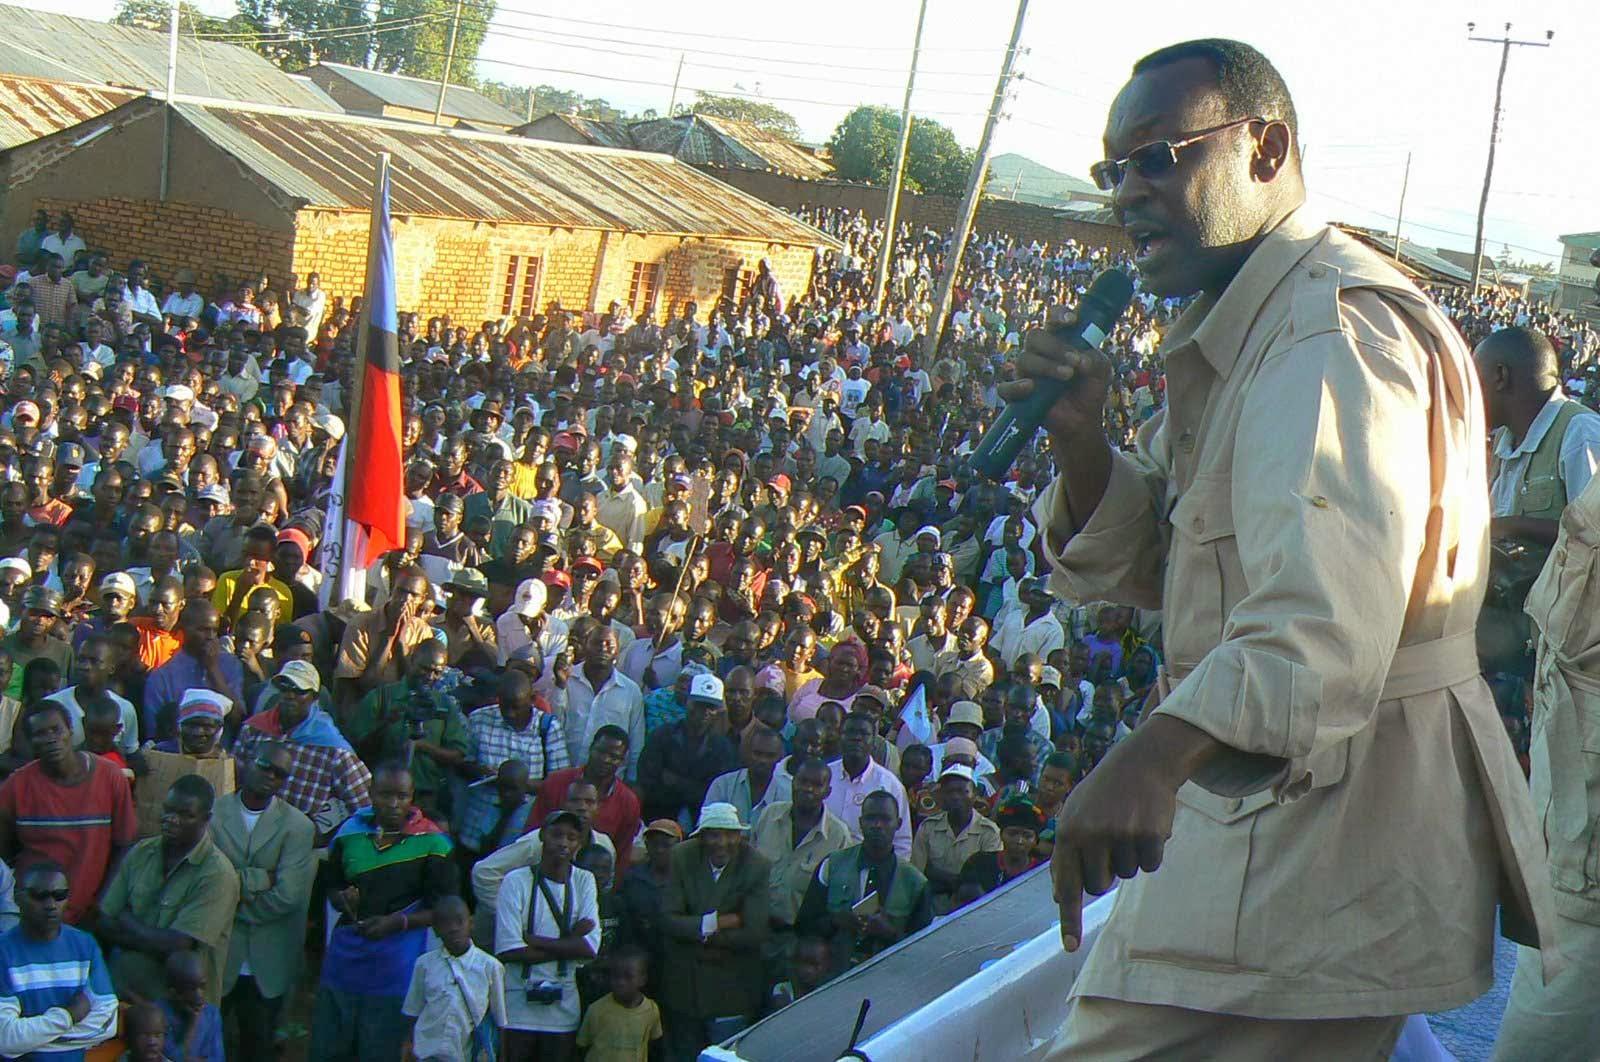 http://www.azizicompdoc.blogspot.com/